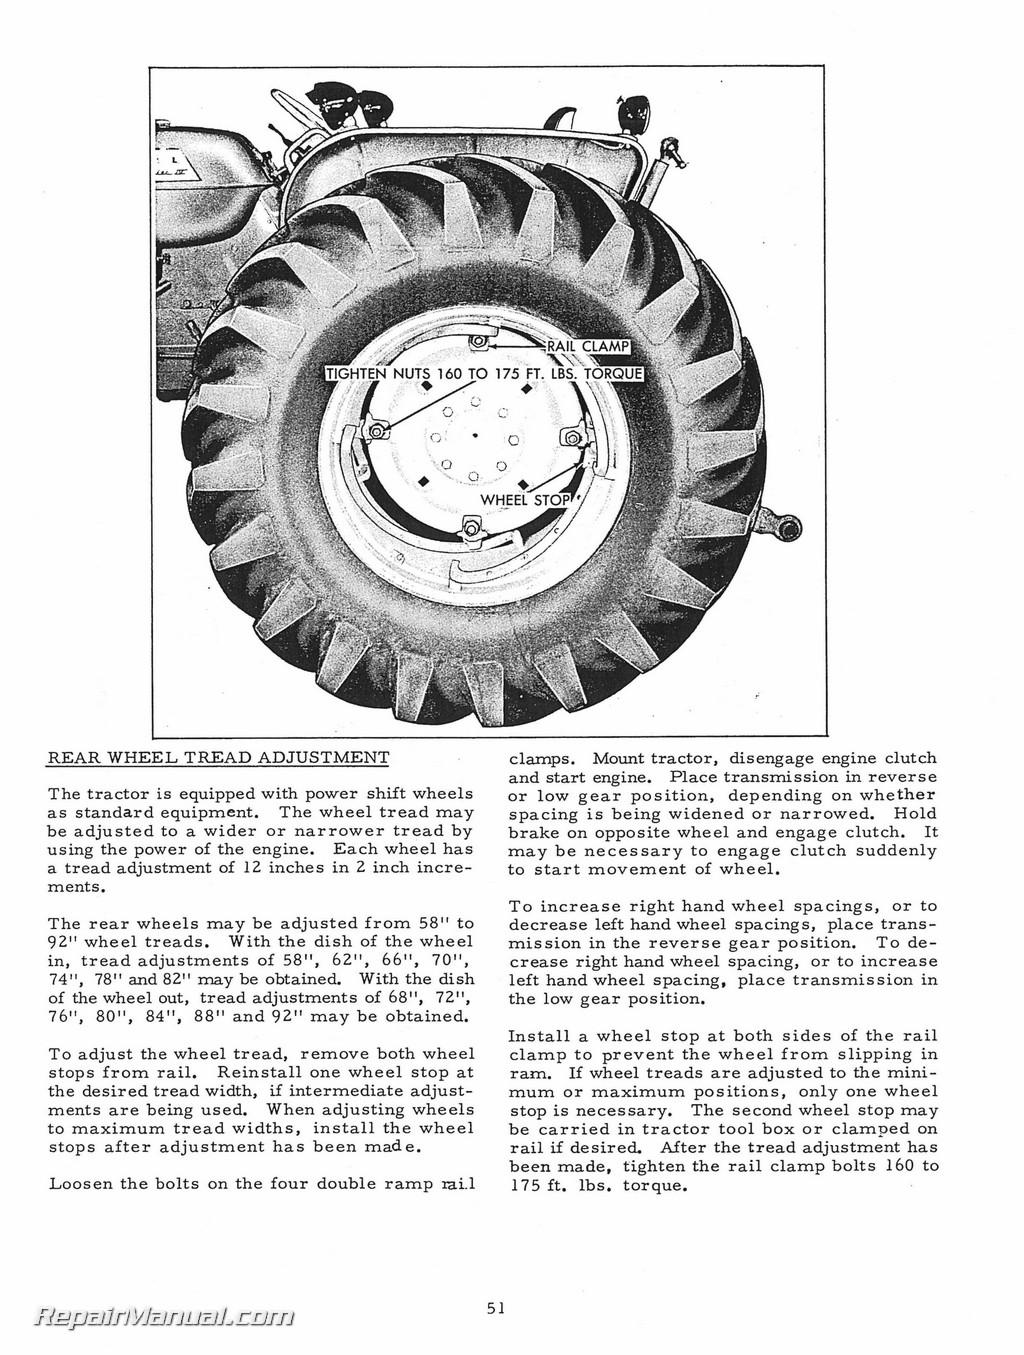 Allis Chalmers D-17 Series IV Tractor Operators Manual